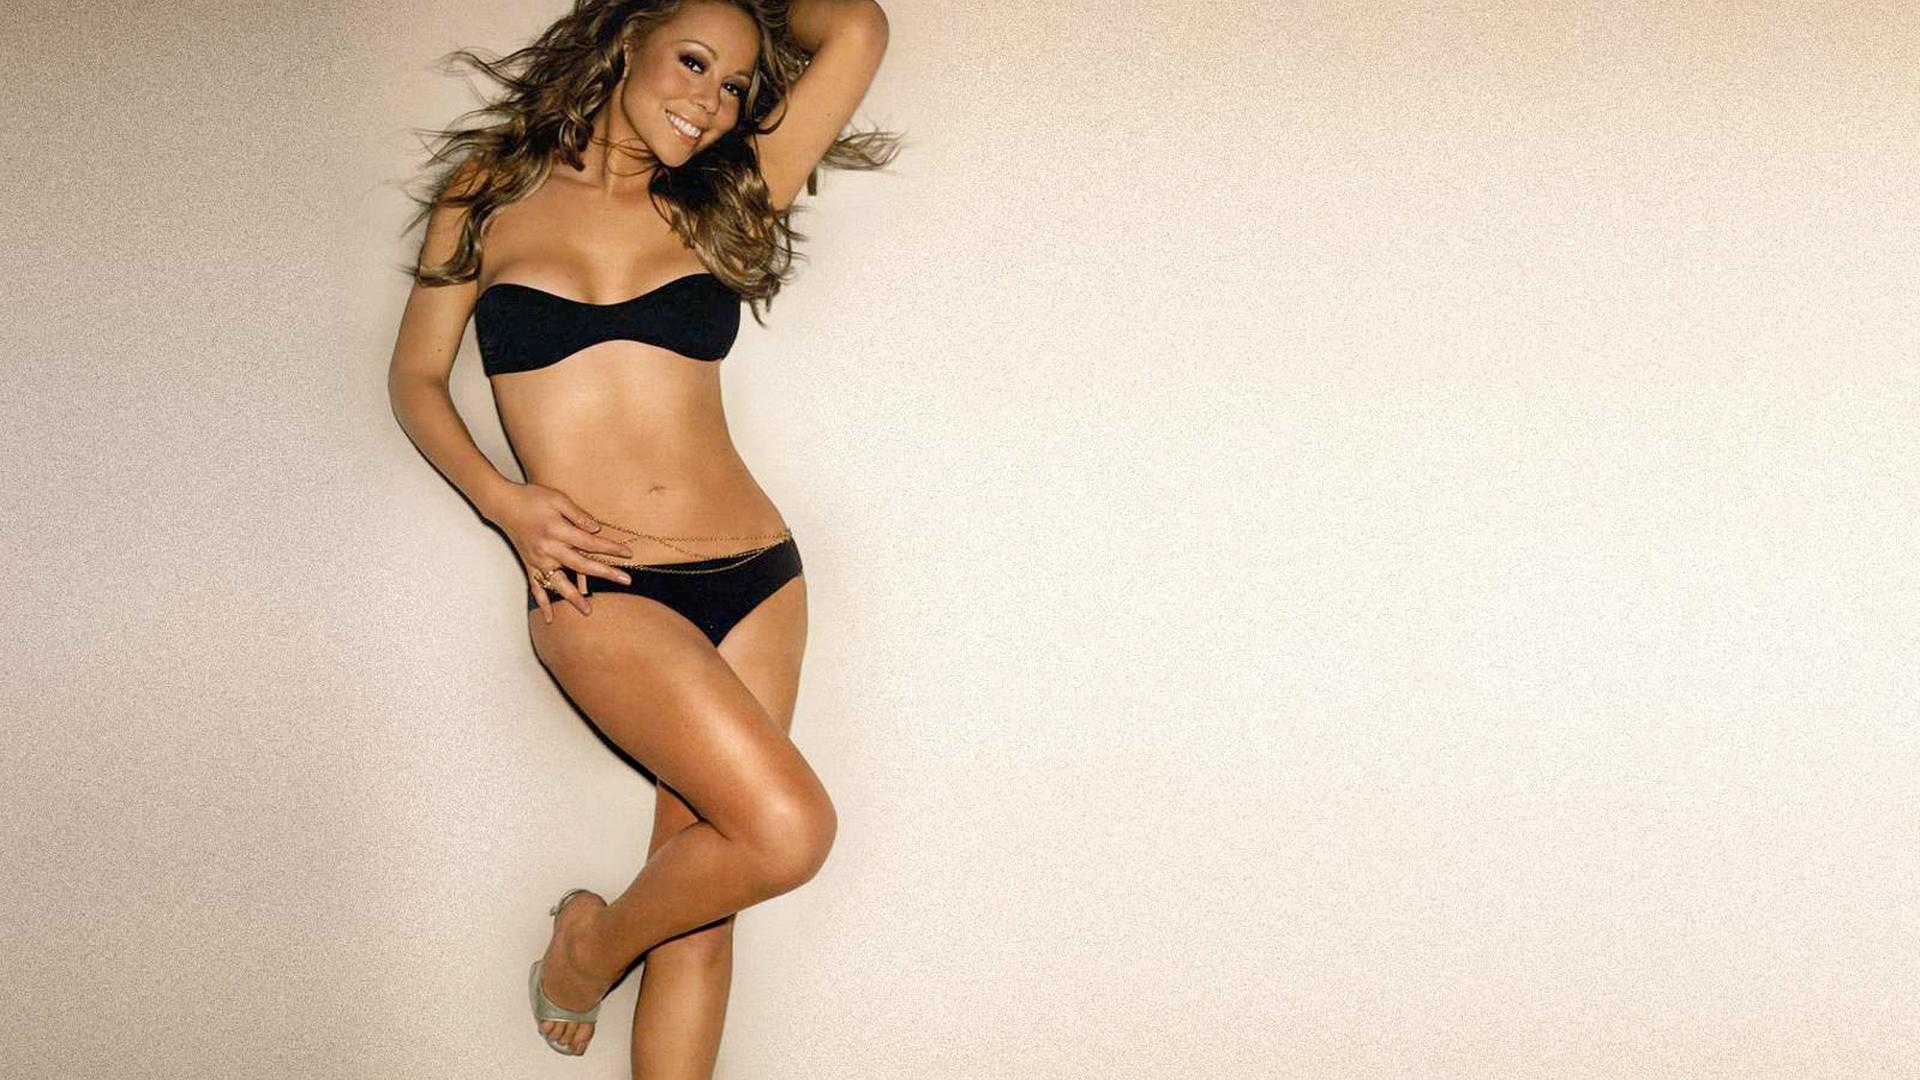 Mariah carey hot photo shoot Star Tracks: Wednesday, May 30, 2018 m